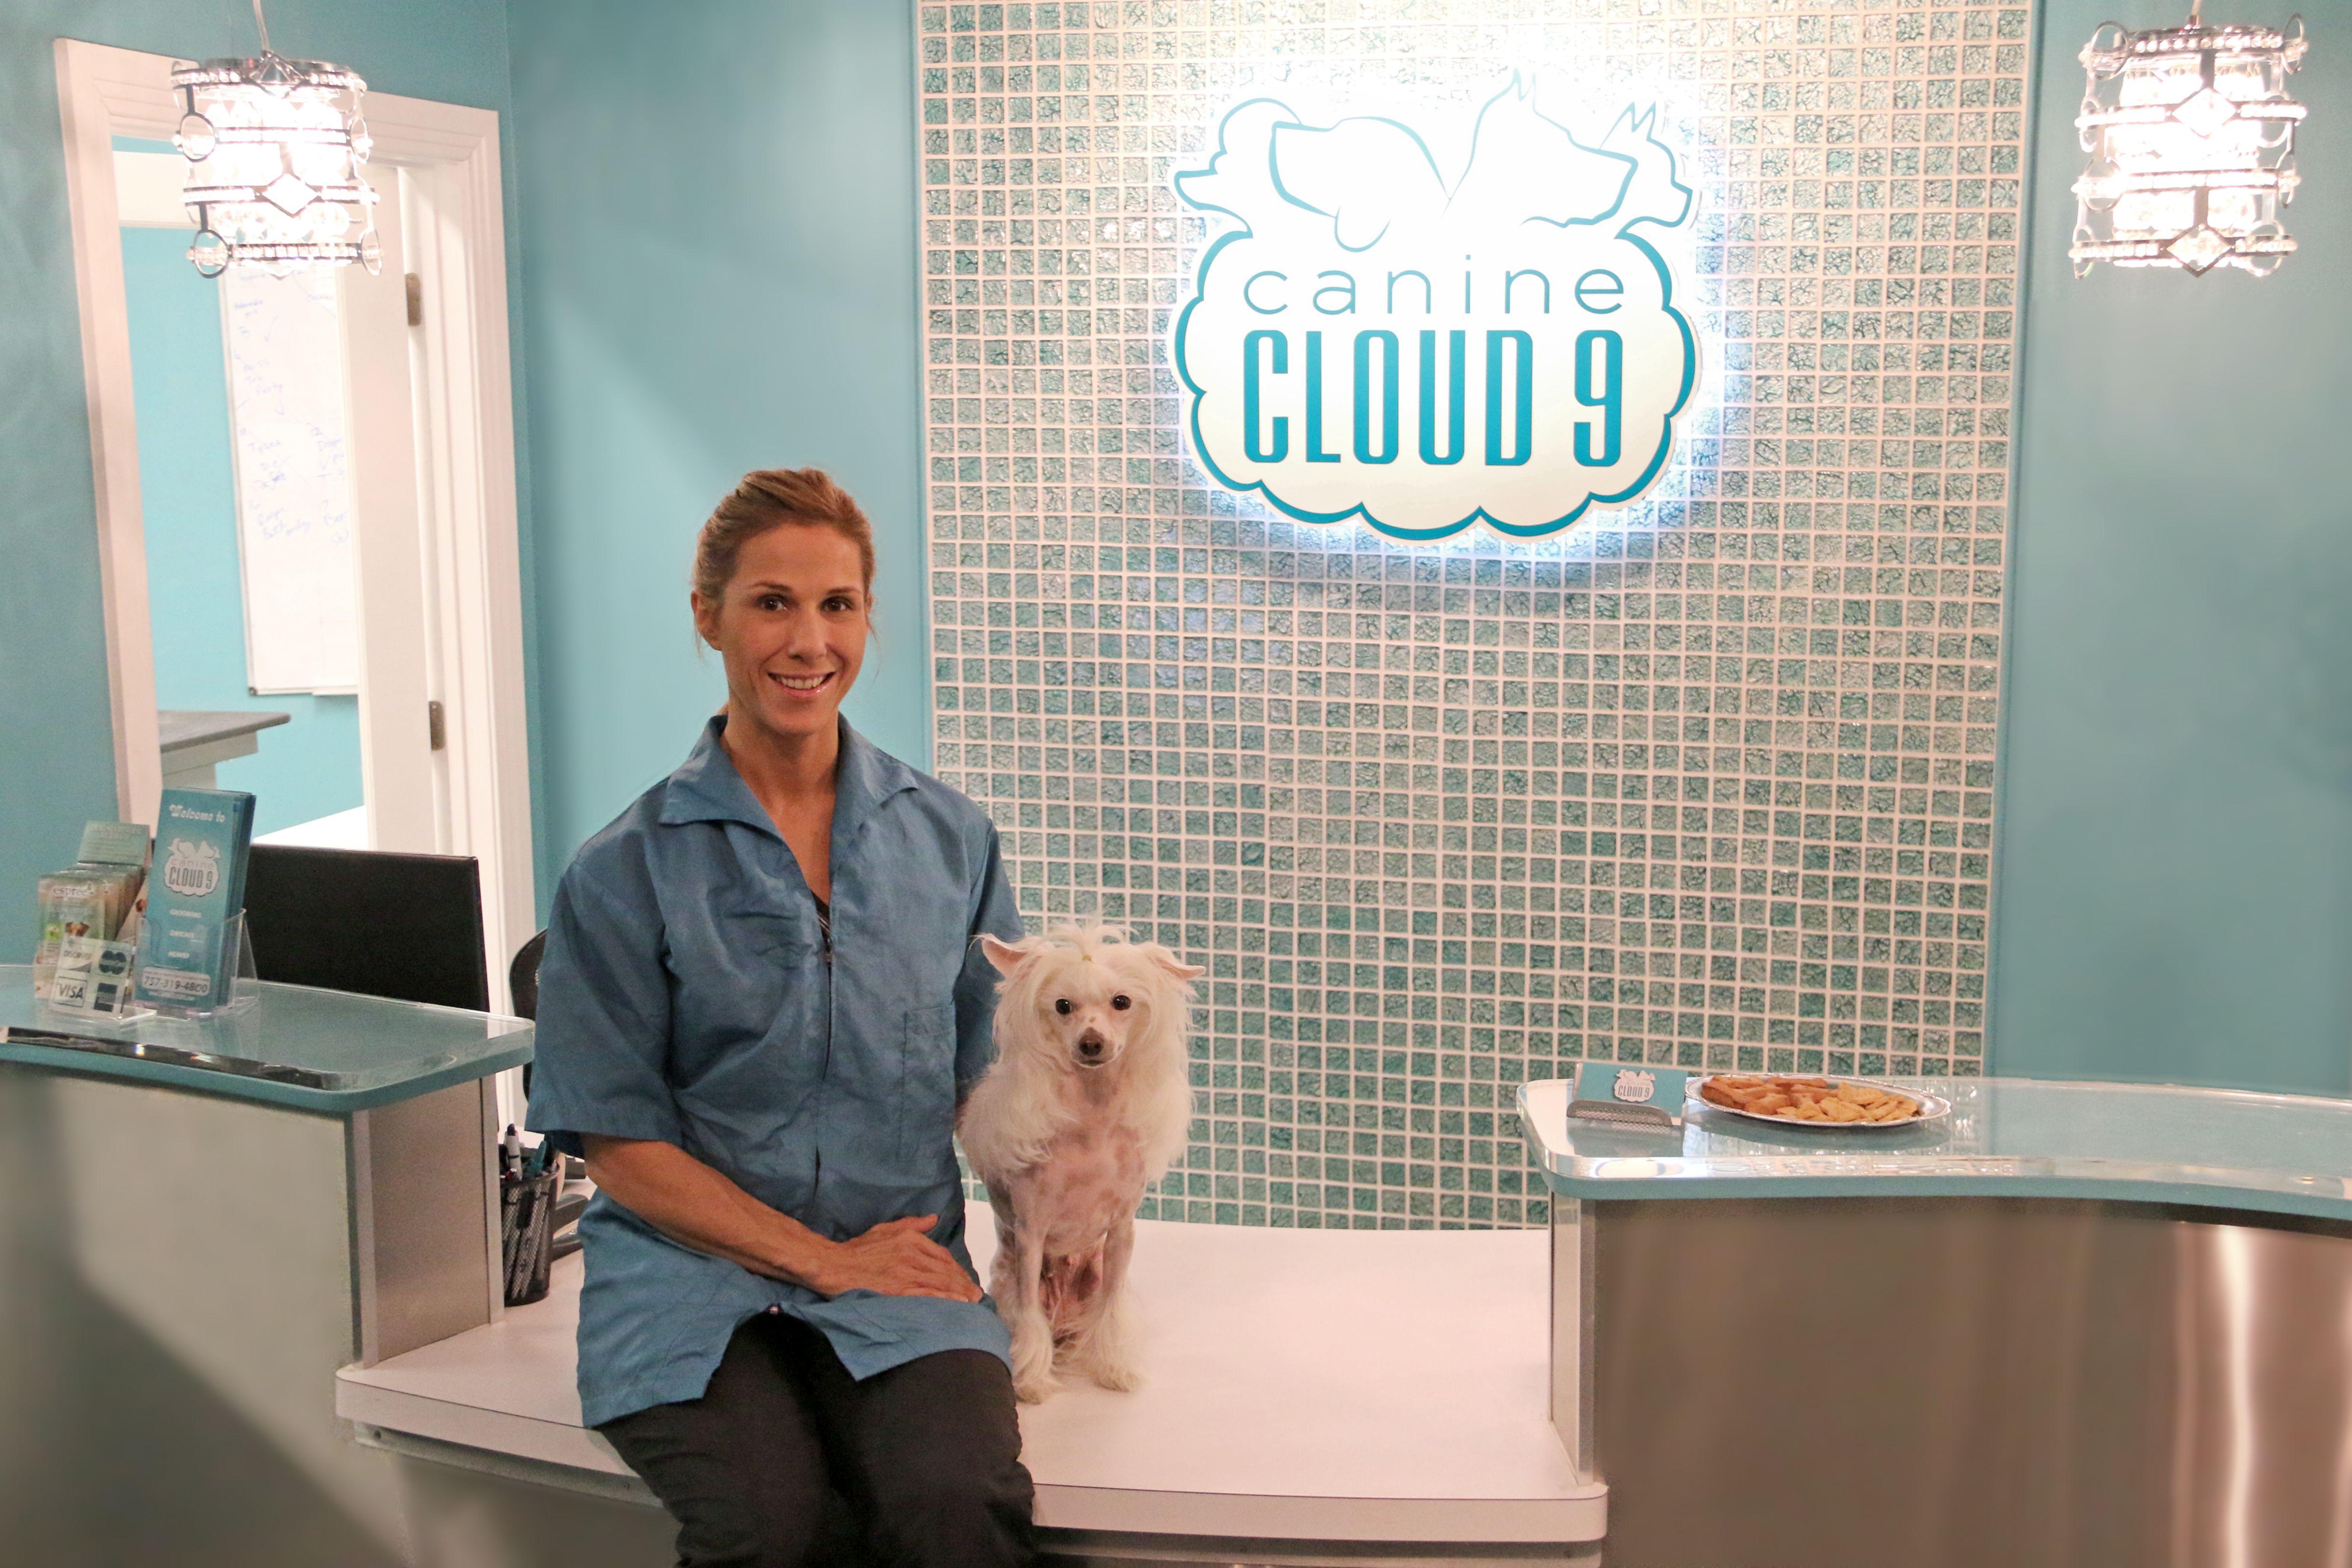 Canine Cloud 9 My Grooming Salon In Virginia Beach Va Dog